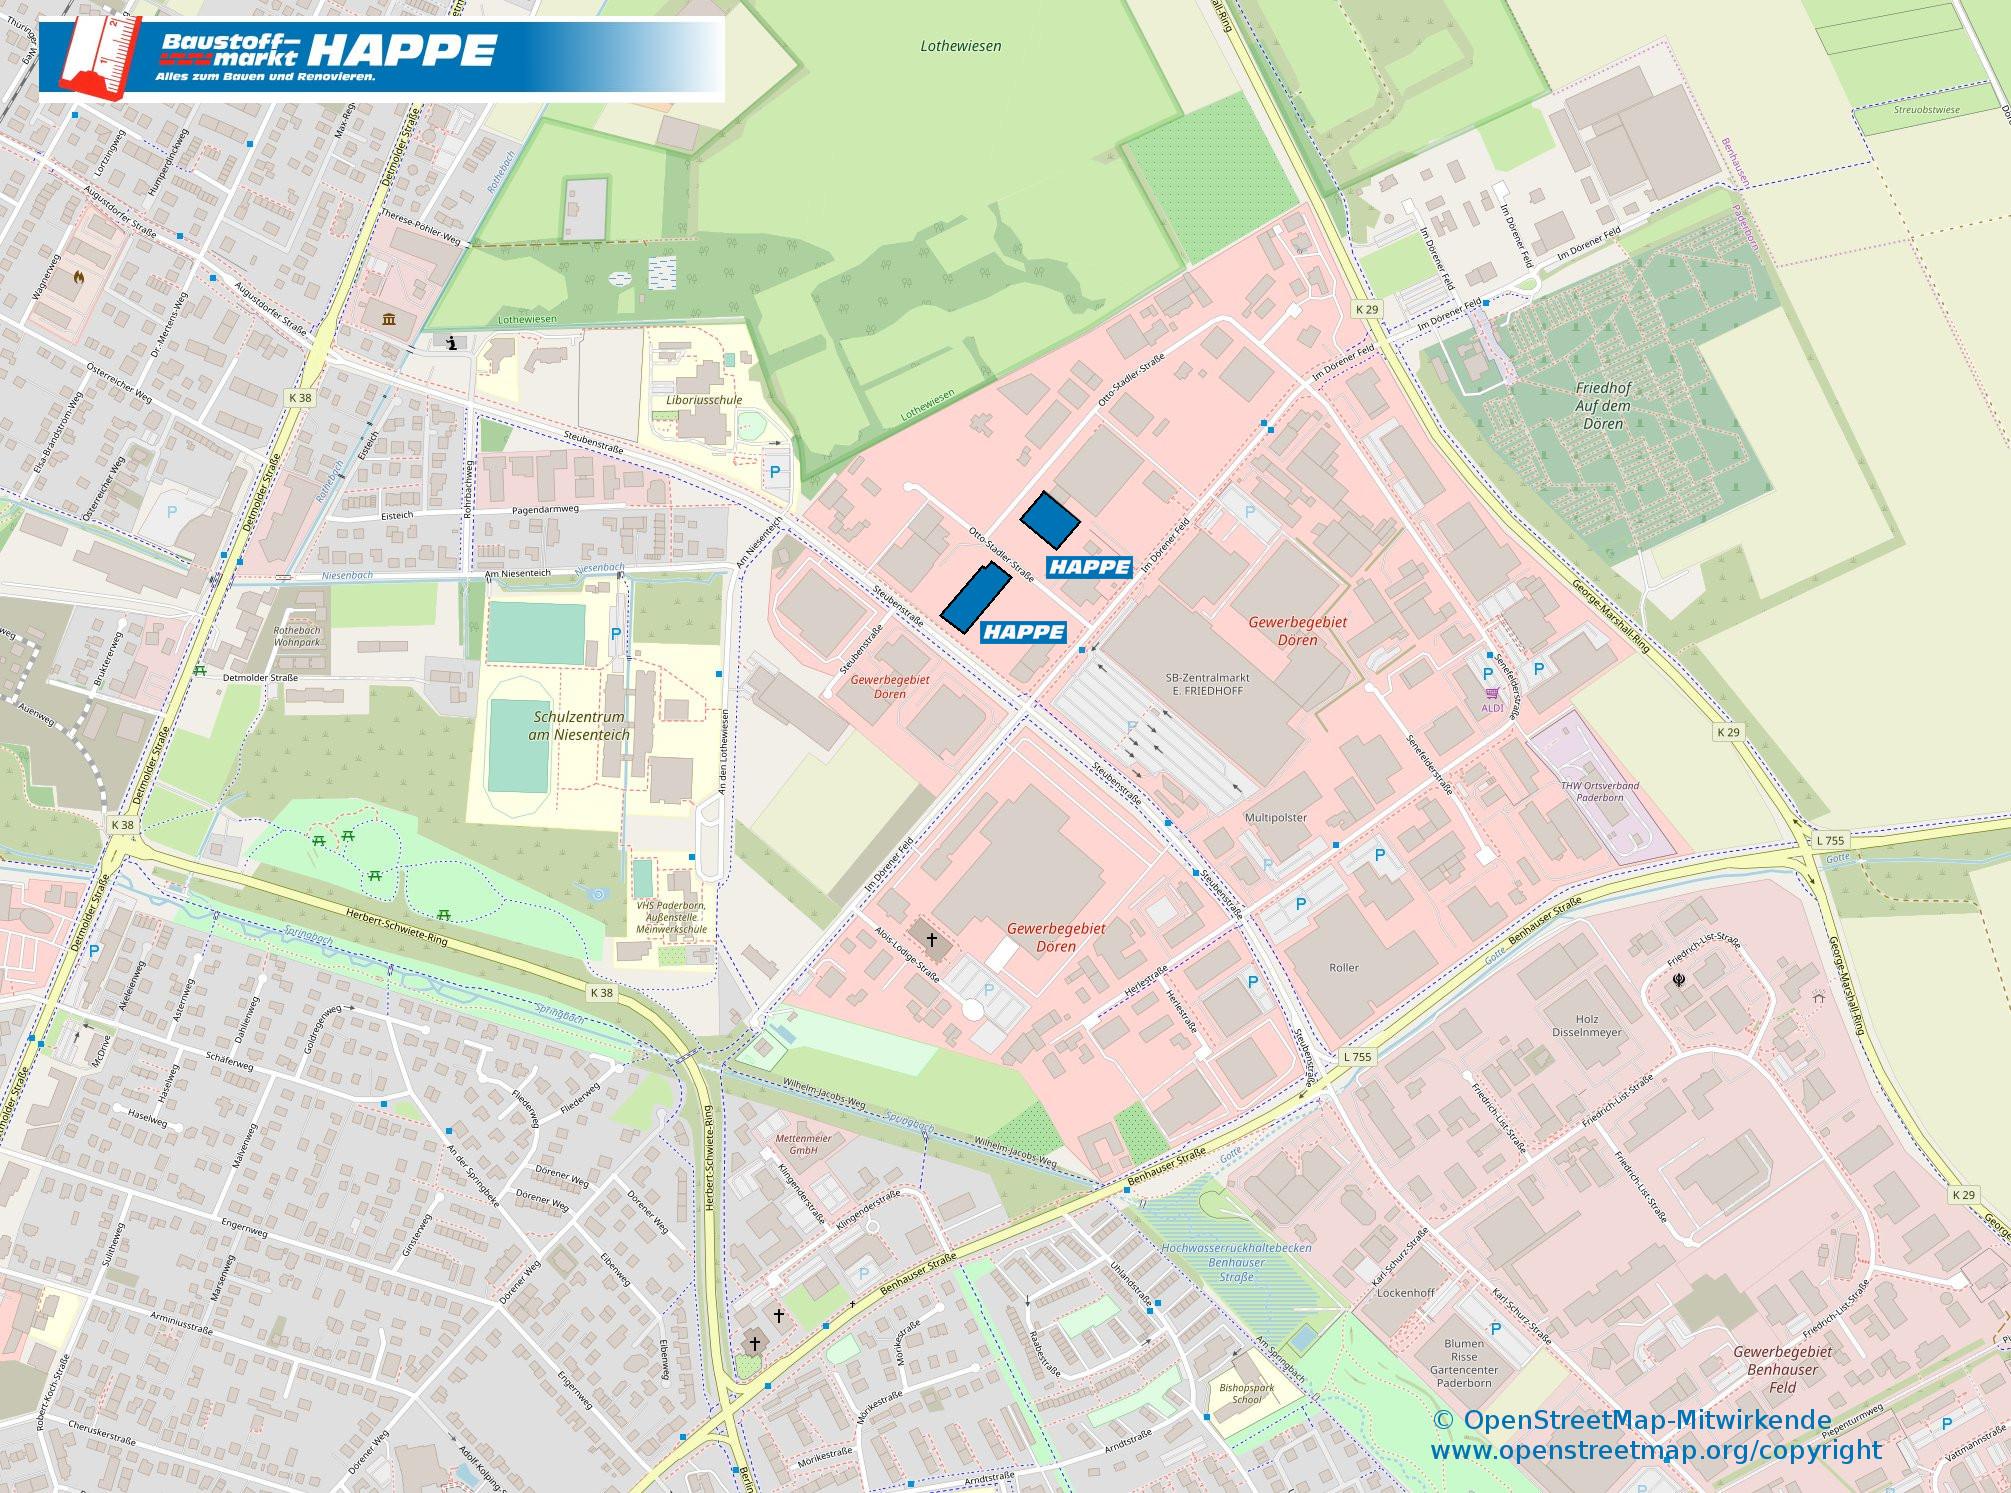 Karte Paderborn.Baustoffmarkt Happe In Paderborn